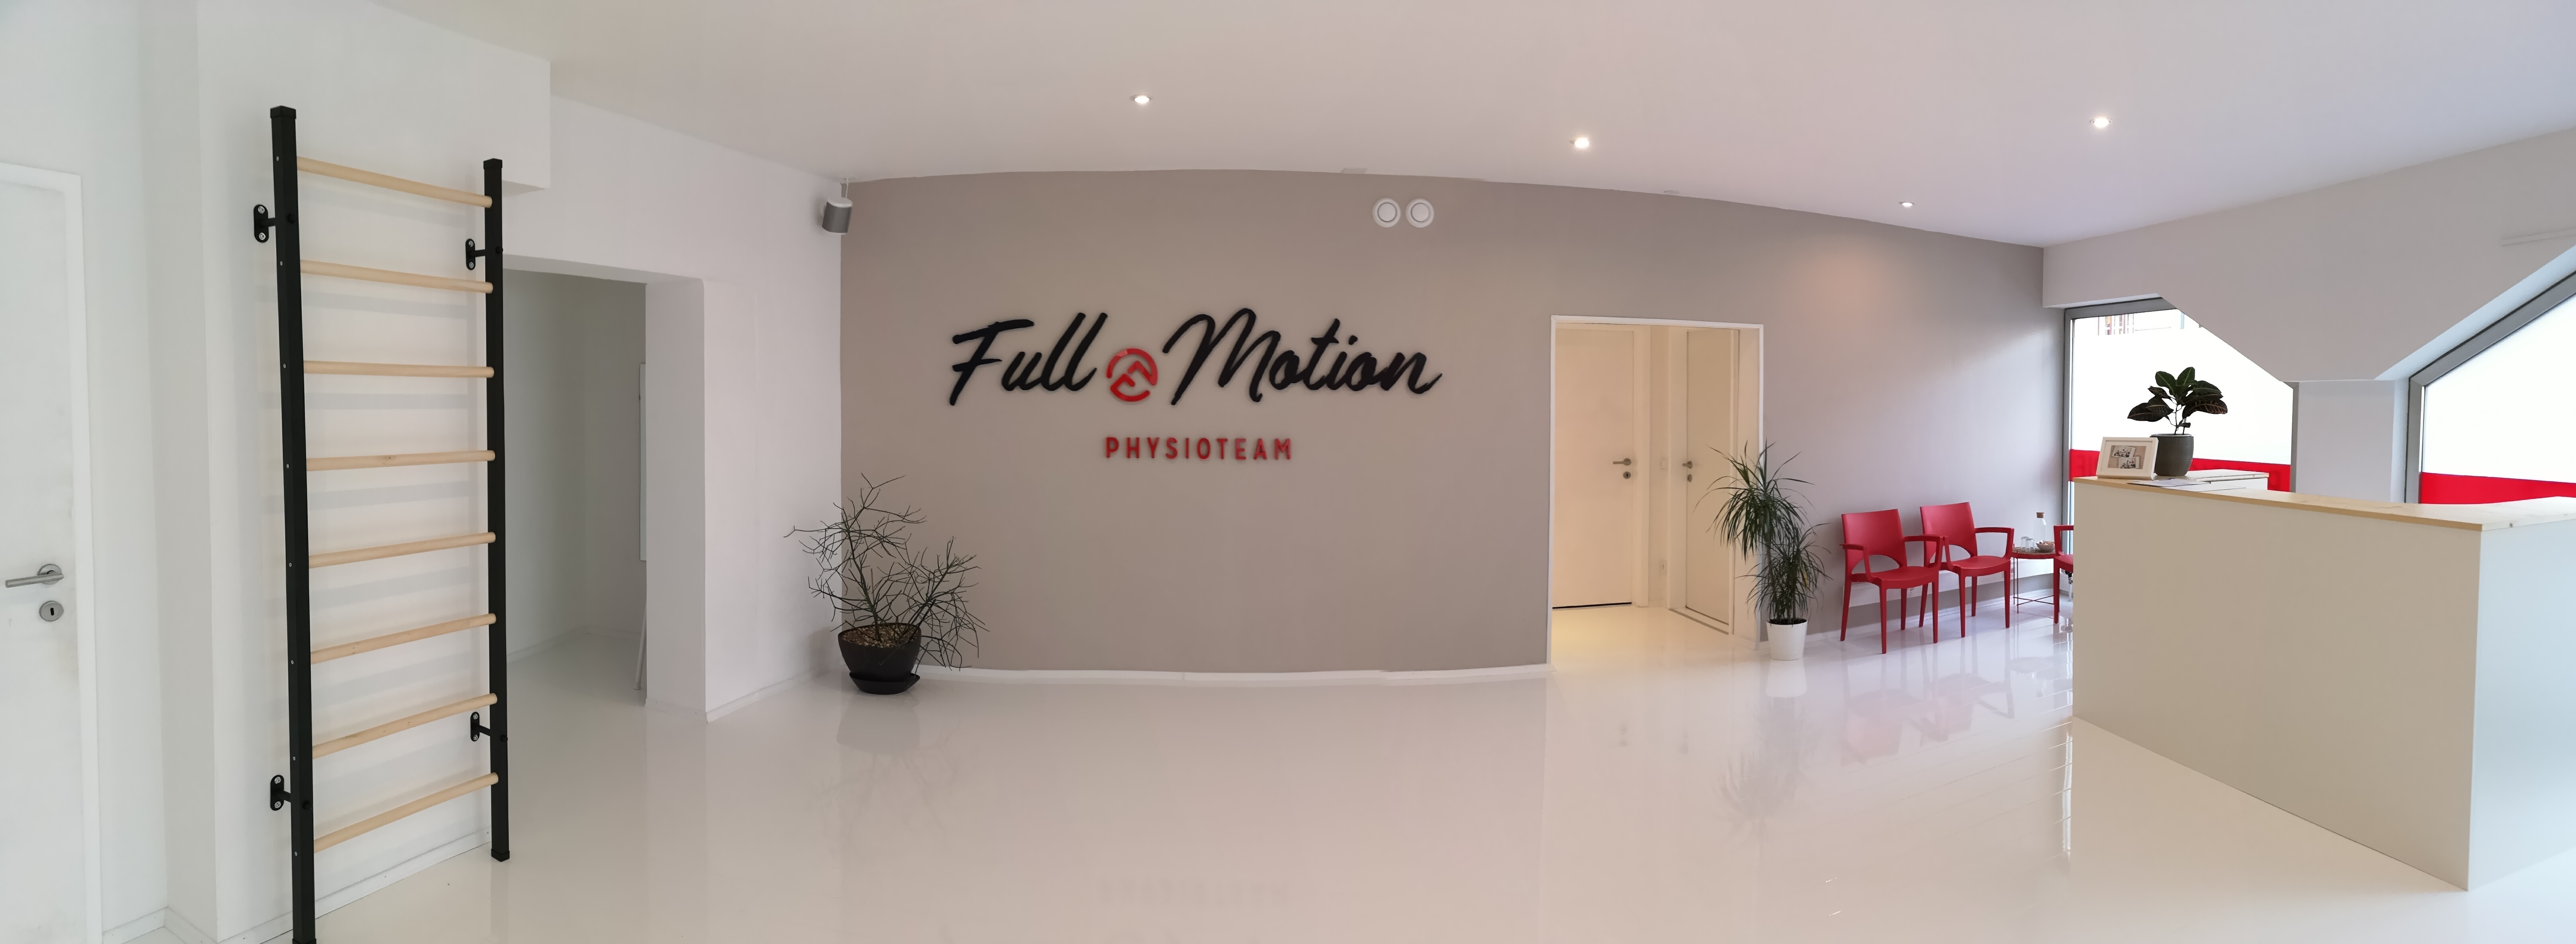 Physio Fullmotion Praxis